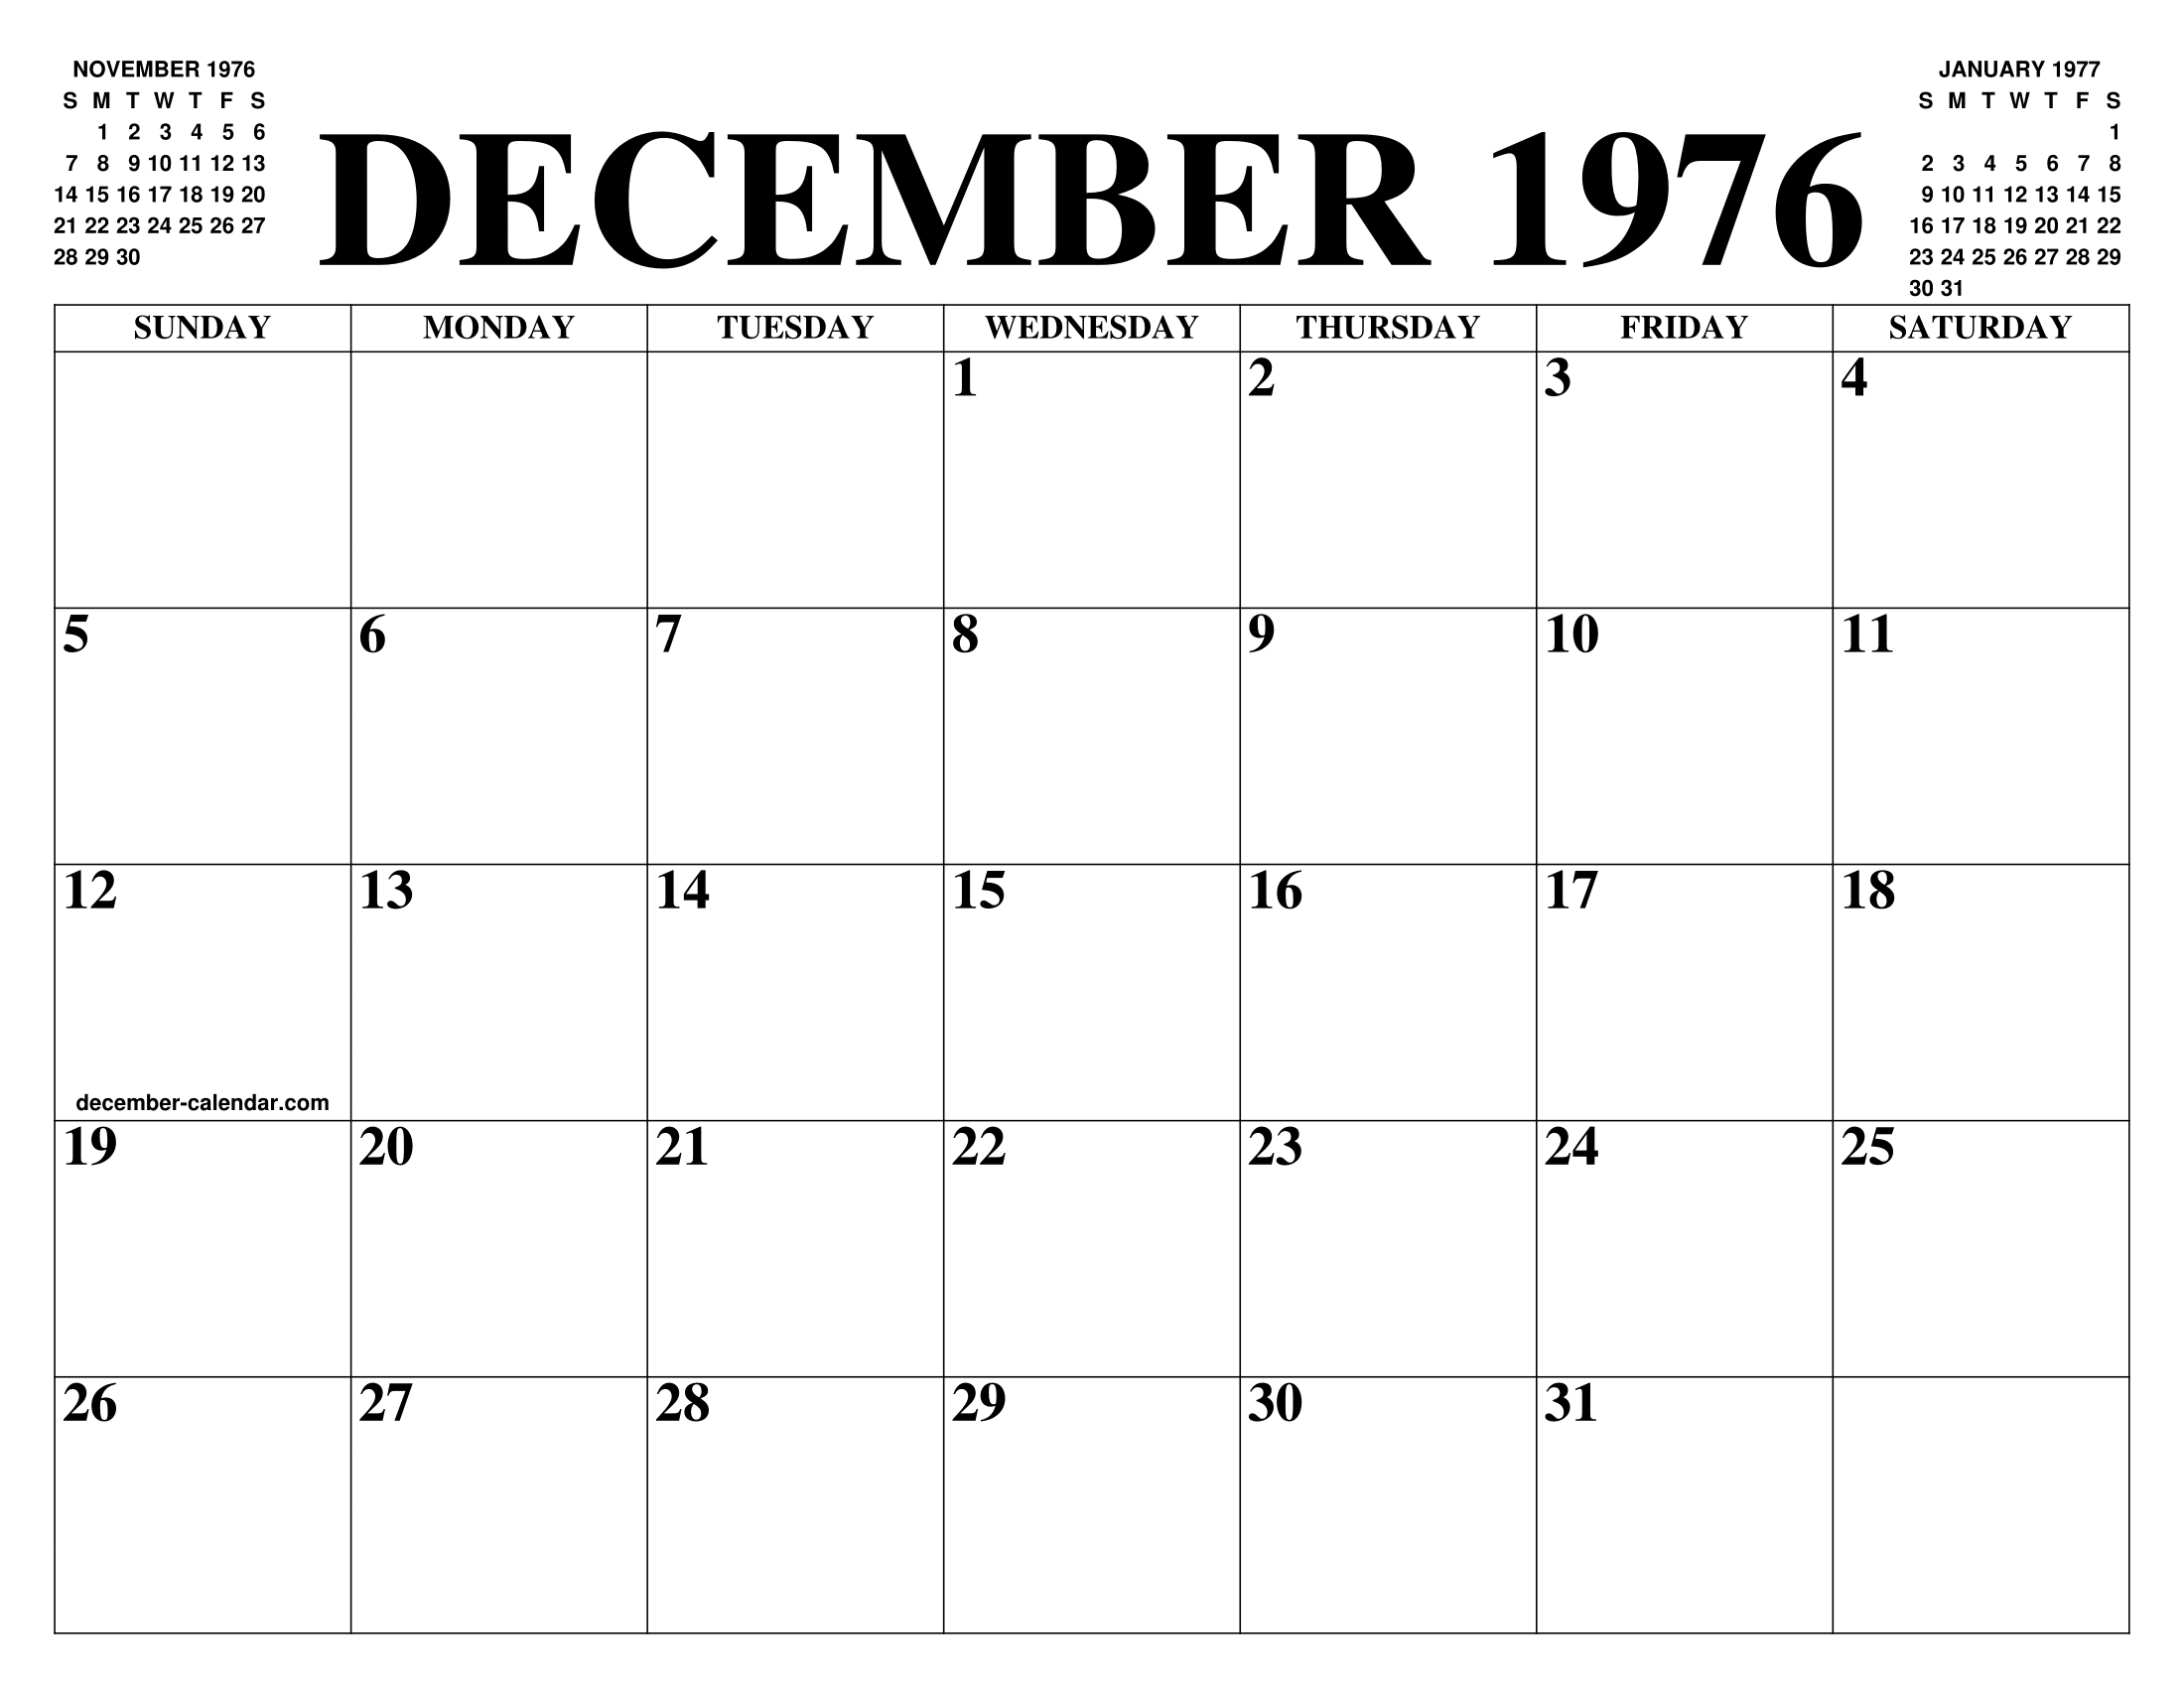 Calendario 1976.December 1976 Calendar Of The Month Free Printable December